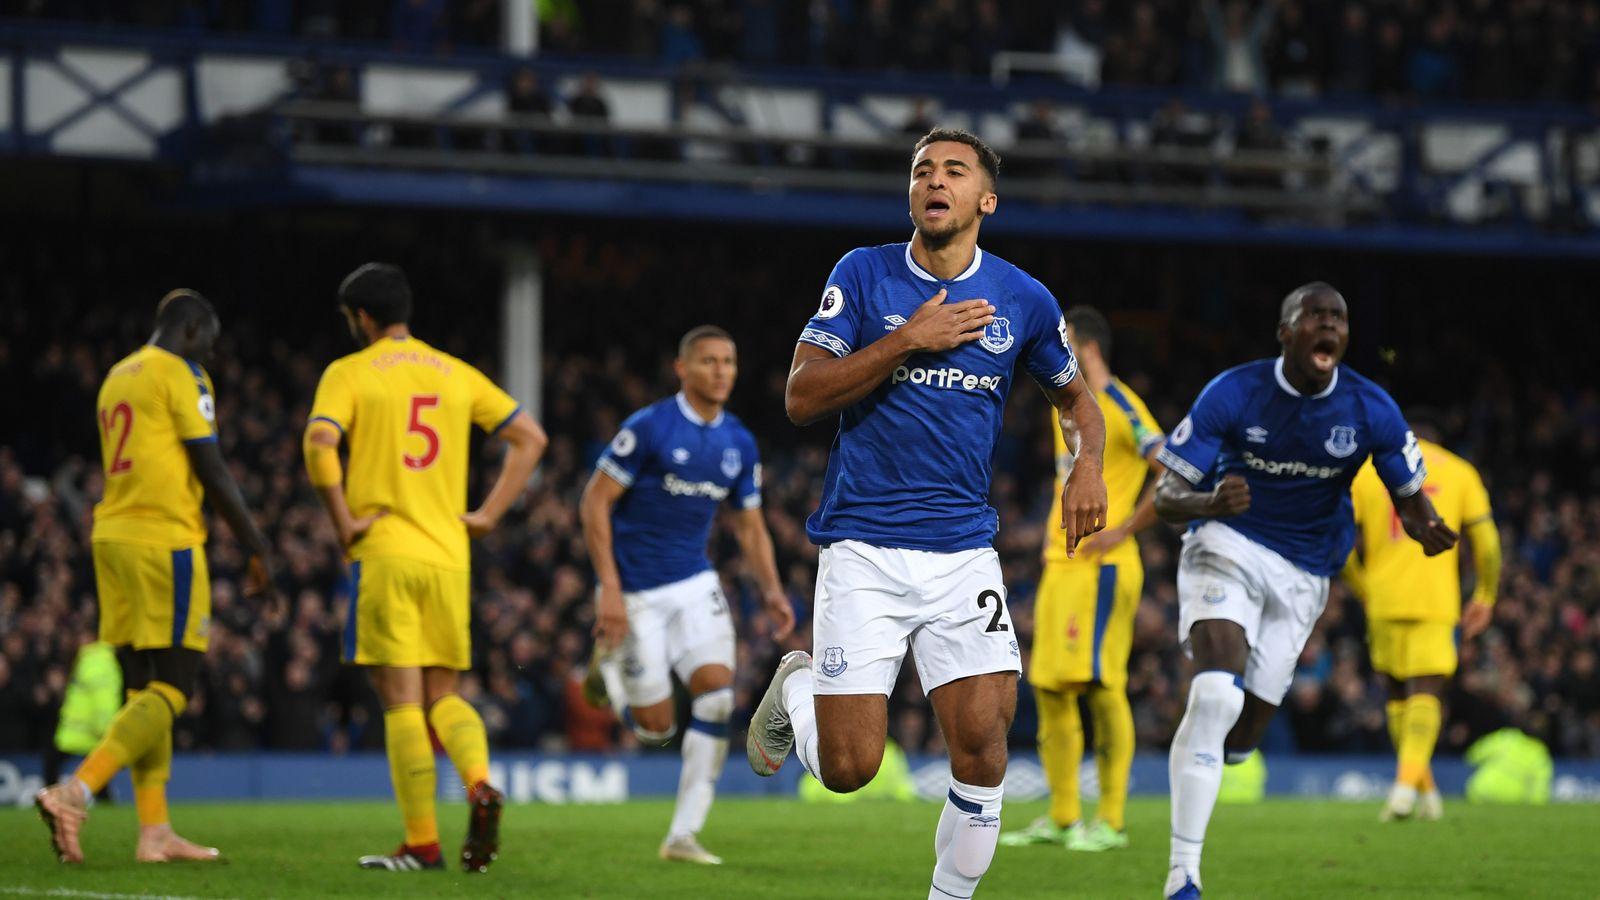 Everton 2 - 0 C Palace - Match Report & Highlights